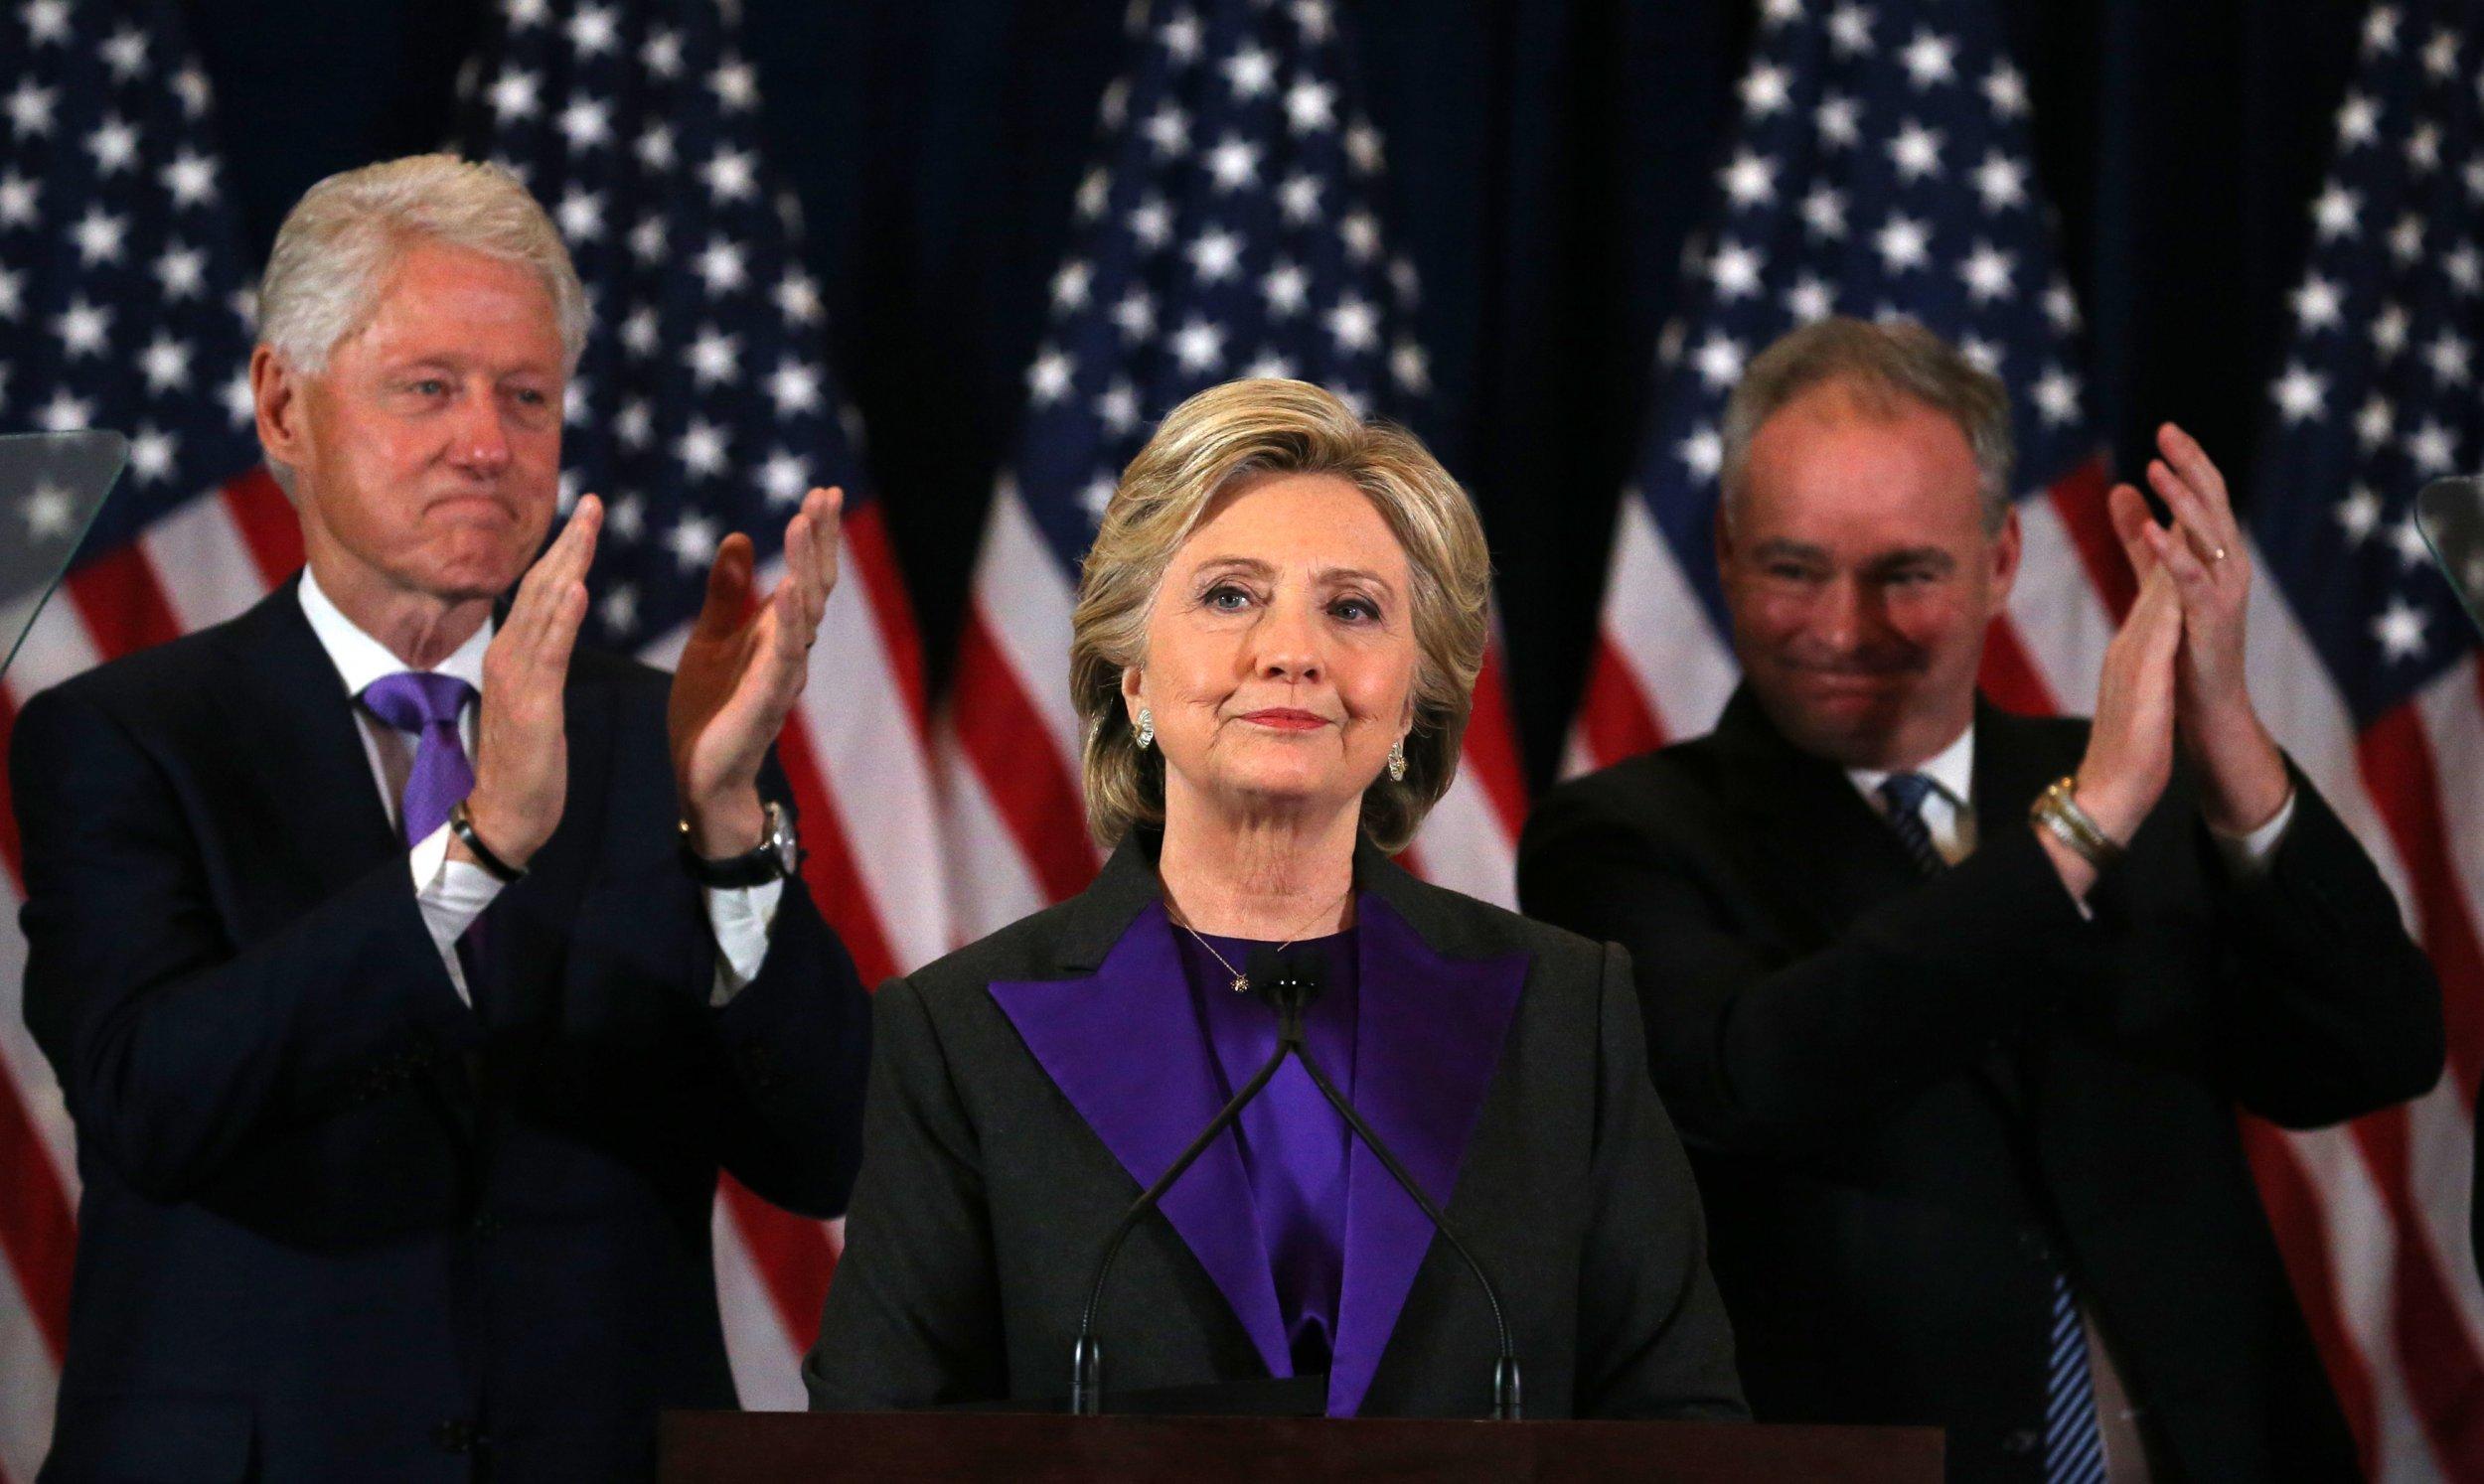 Hillary Clinton concession speech 2016